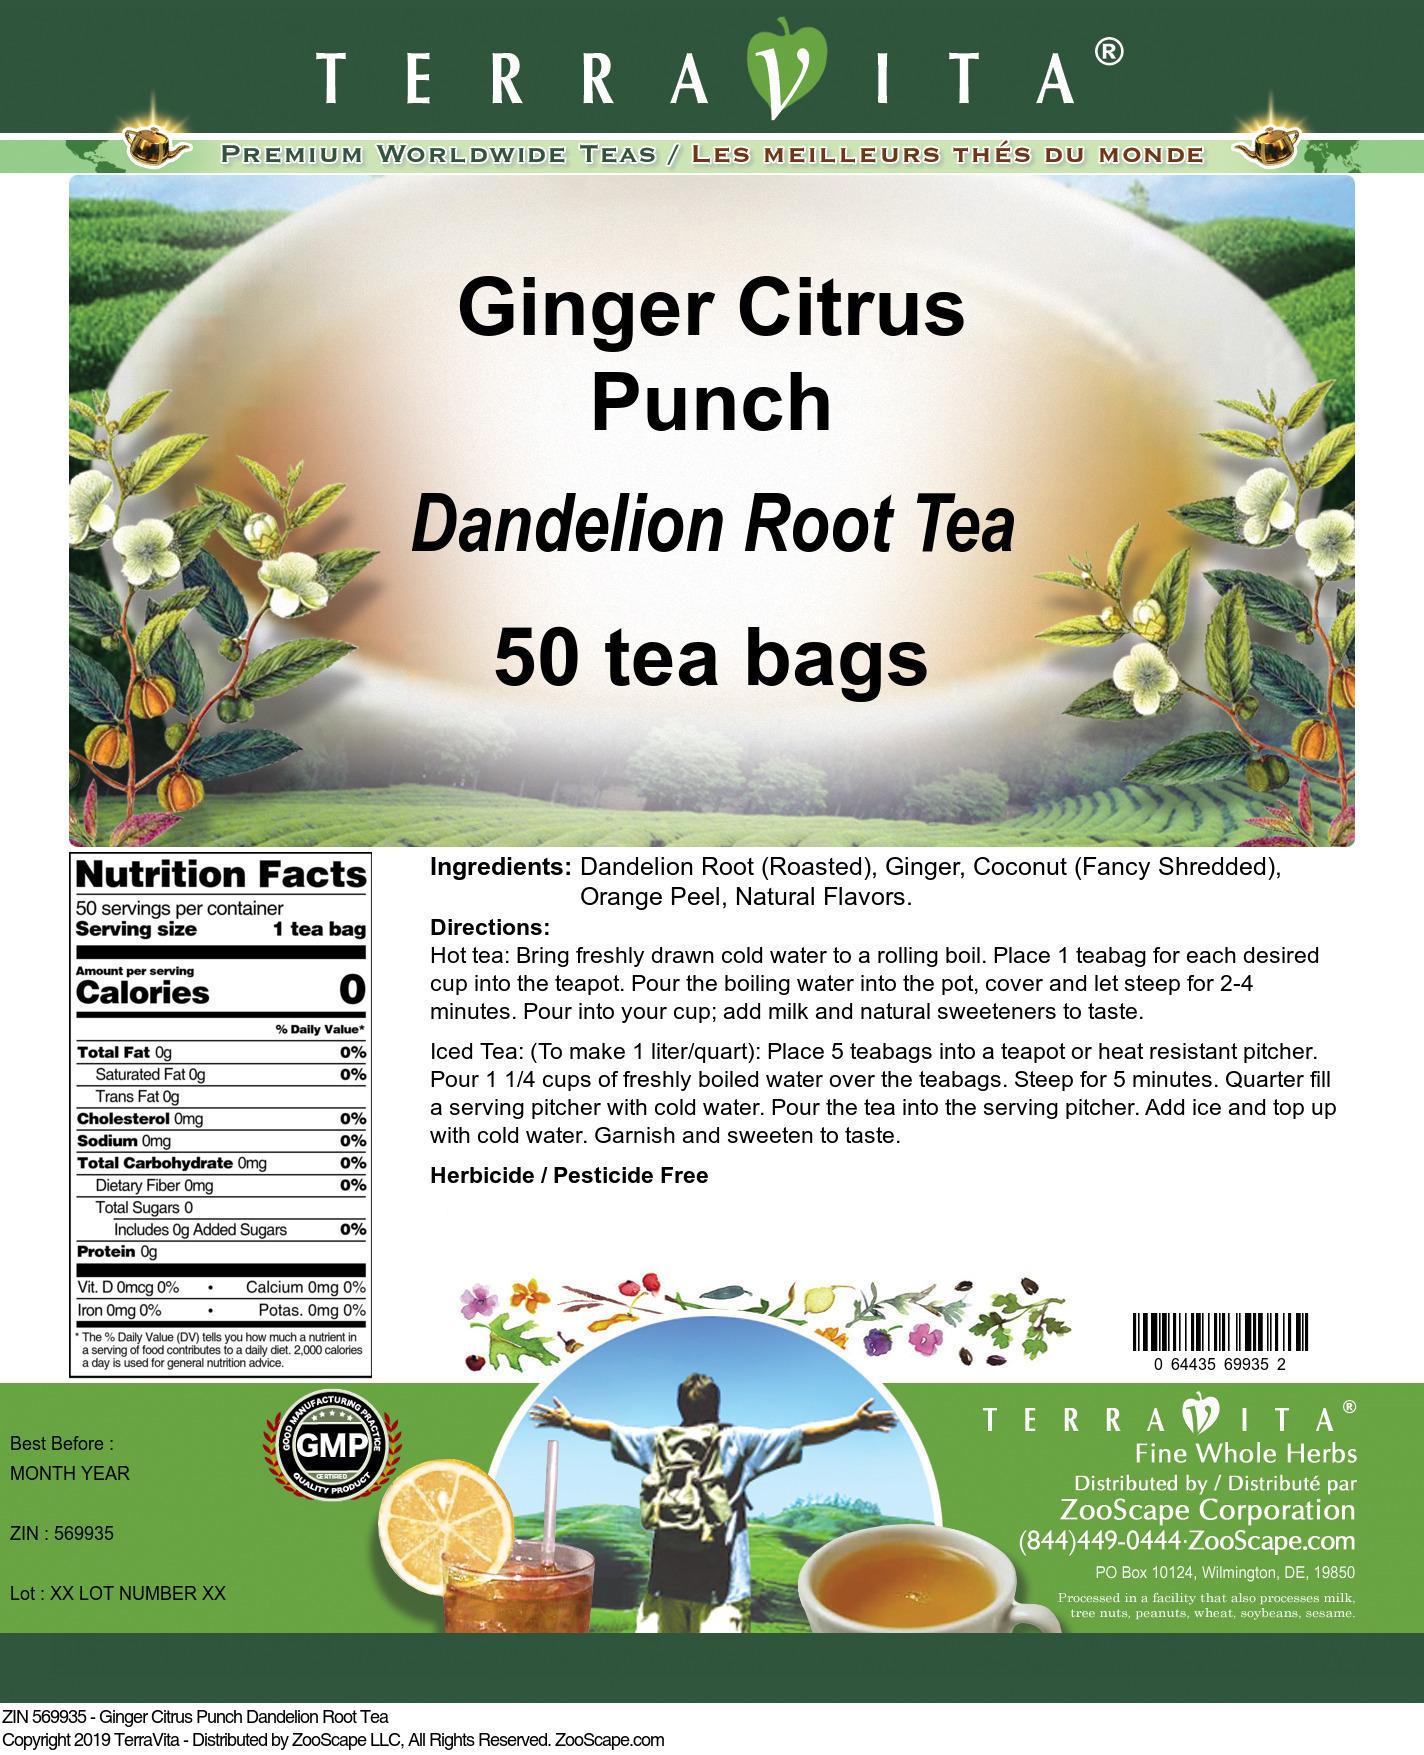 Ginger Citrus Punch Dandelion Root